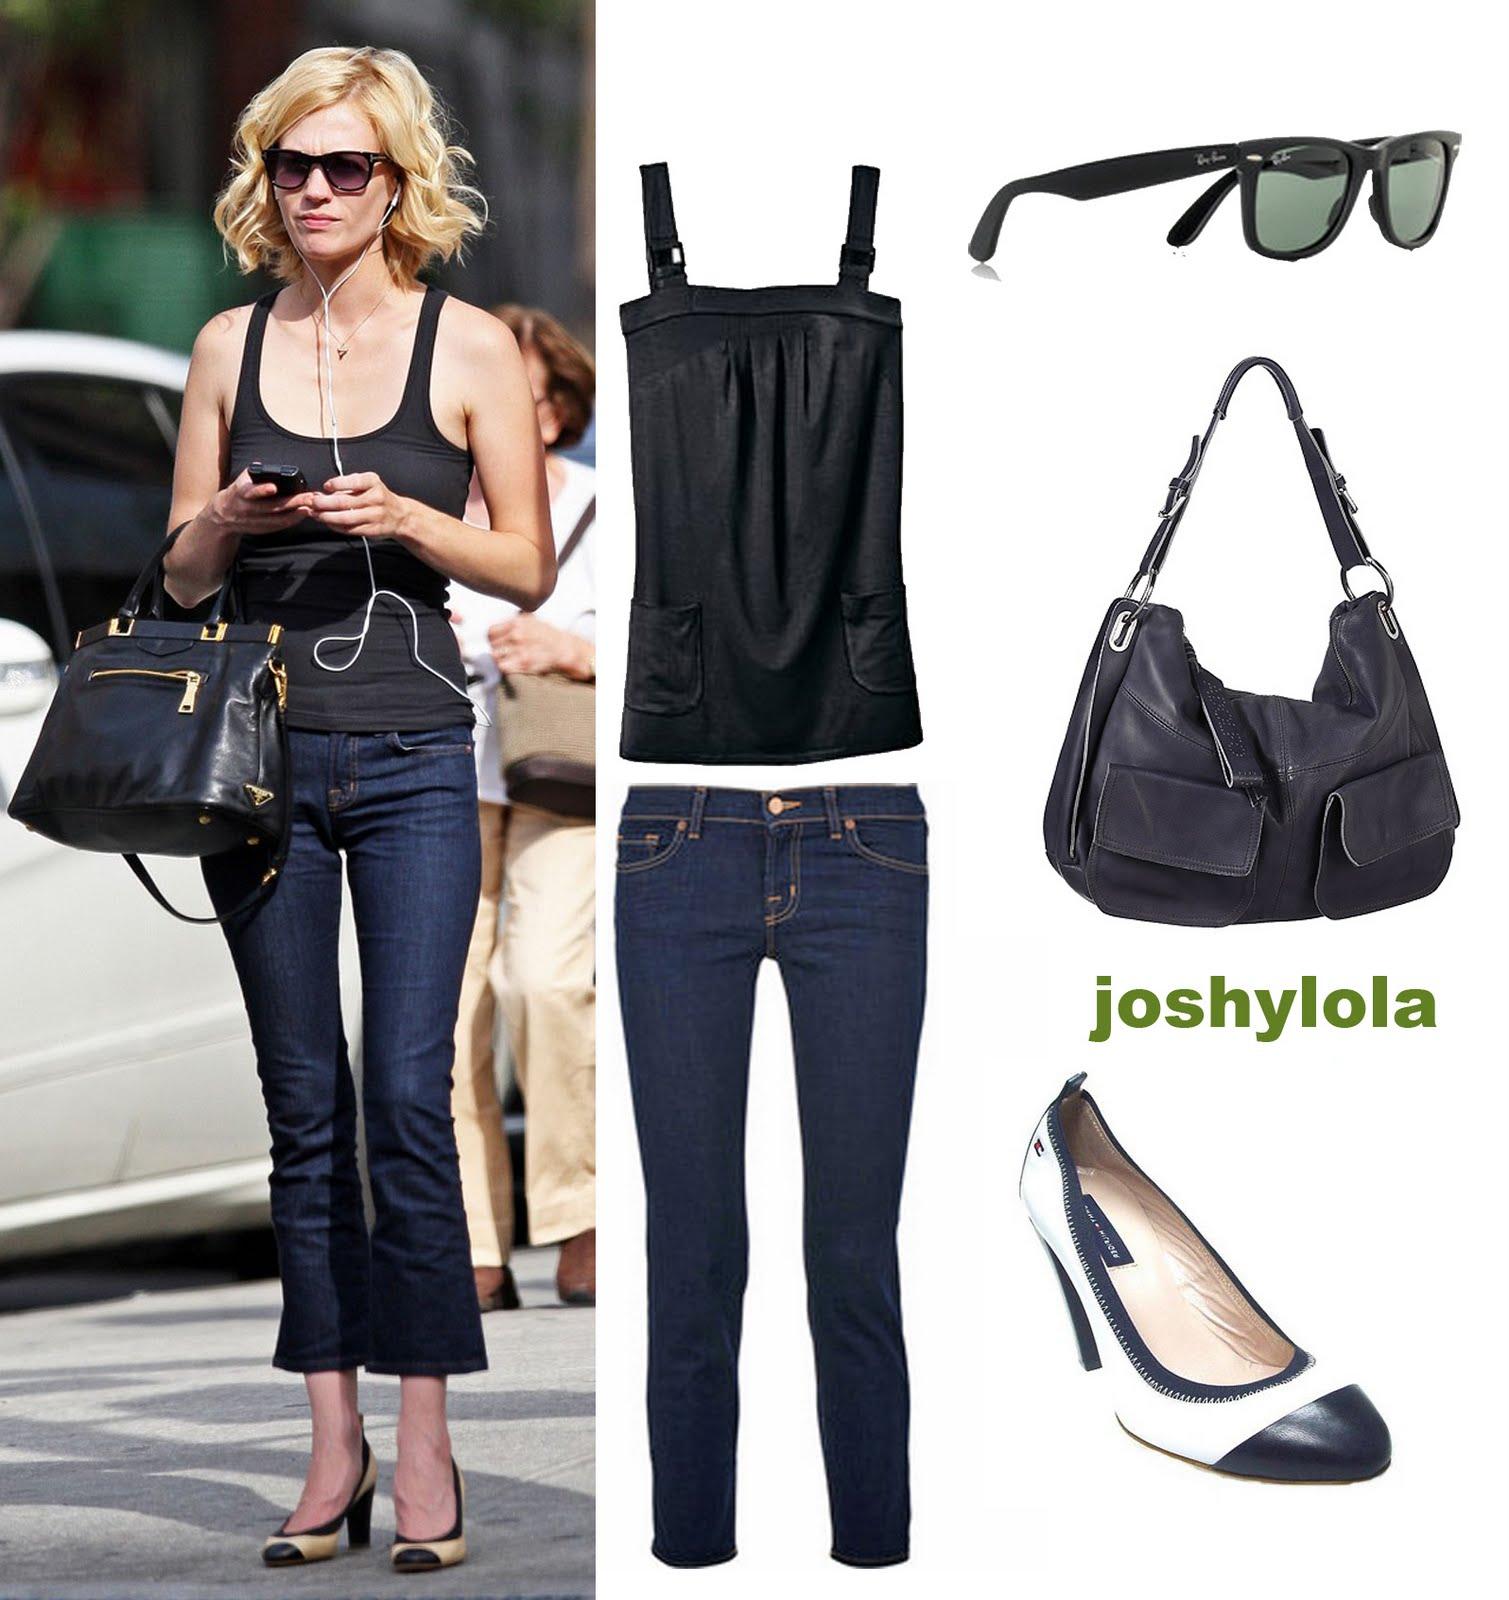 http://2.bp.blogspot.com/_cDEf3NR4G3M/TE2lNuDEn6I/AAAAAAAAPgk/ycWQRDSEEbk/s1600/joshylola-january+jones.jpg